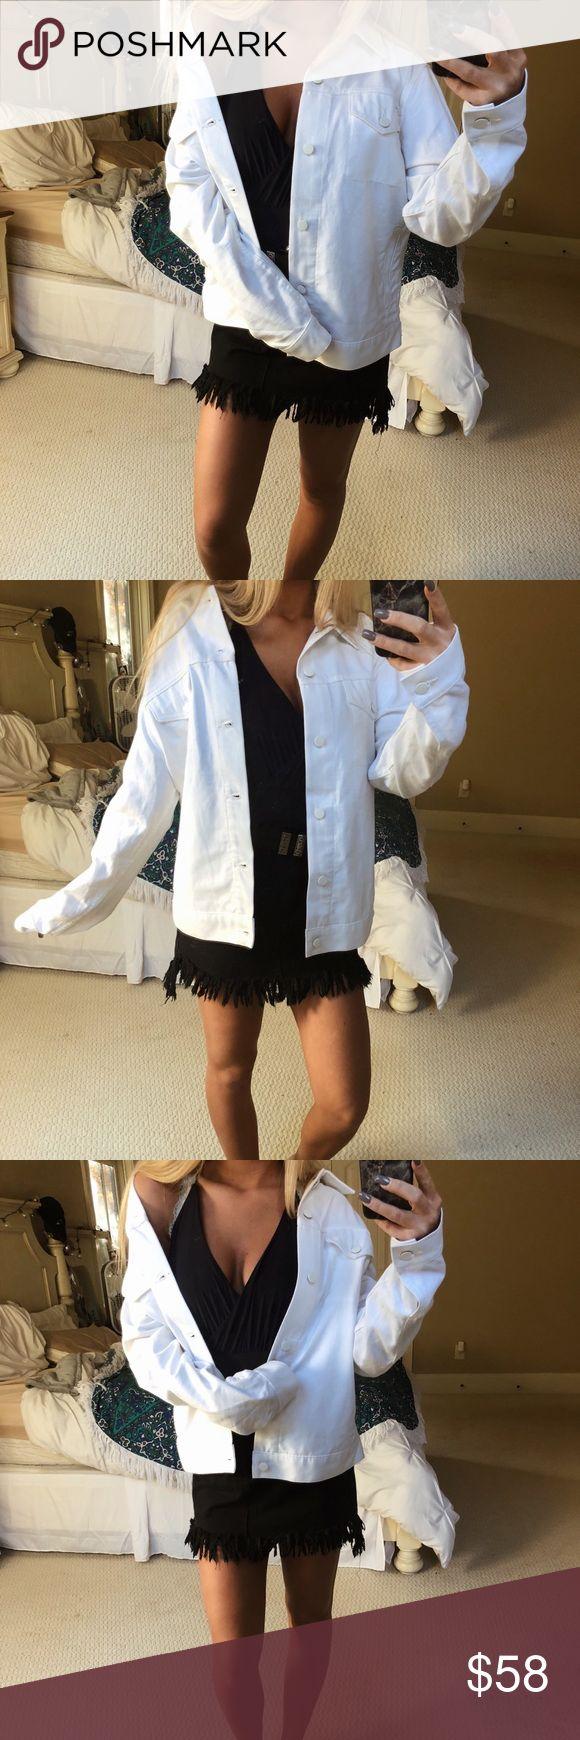 white AA denim jacket gorgeous white American apparel denim jacket. super high quality and cozy! oversized, boyfriend style fit. size medium — worn once 🌿🌿🍂☕️🌄✨ American Apparel Jackets & Coats Jean Jackets